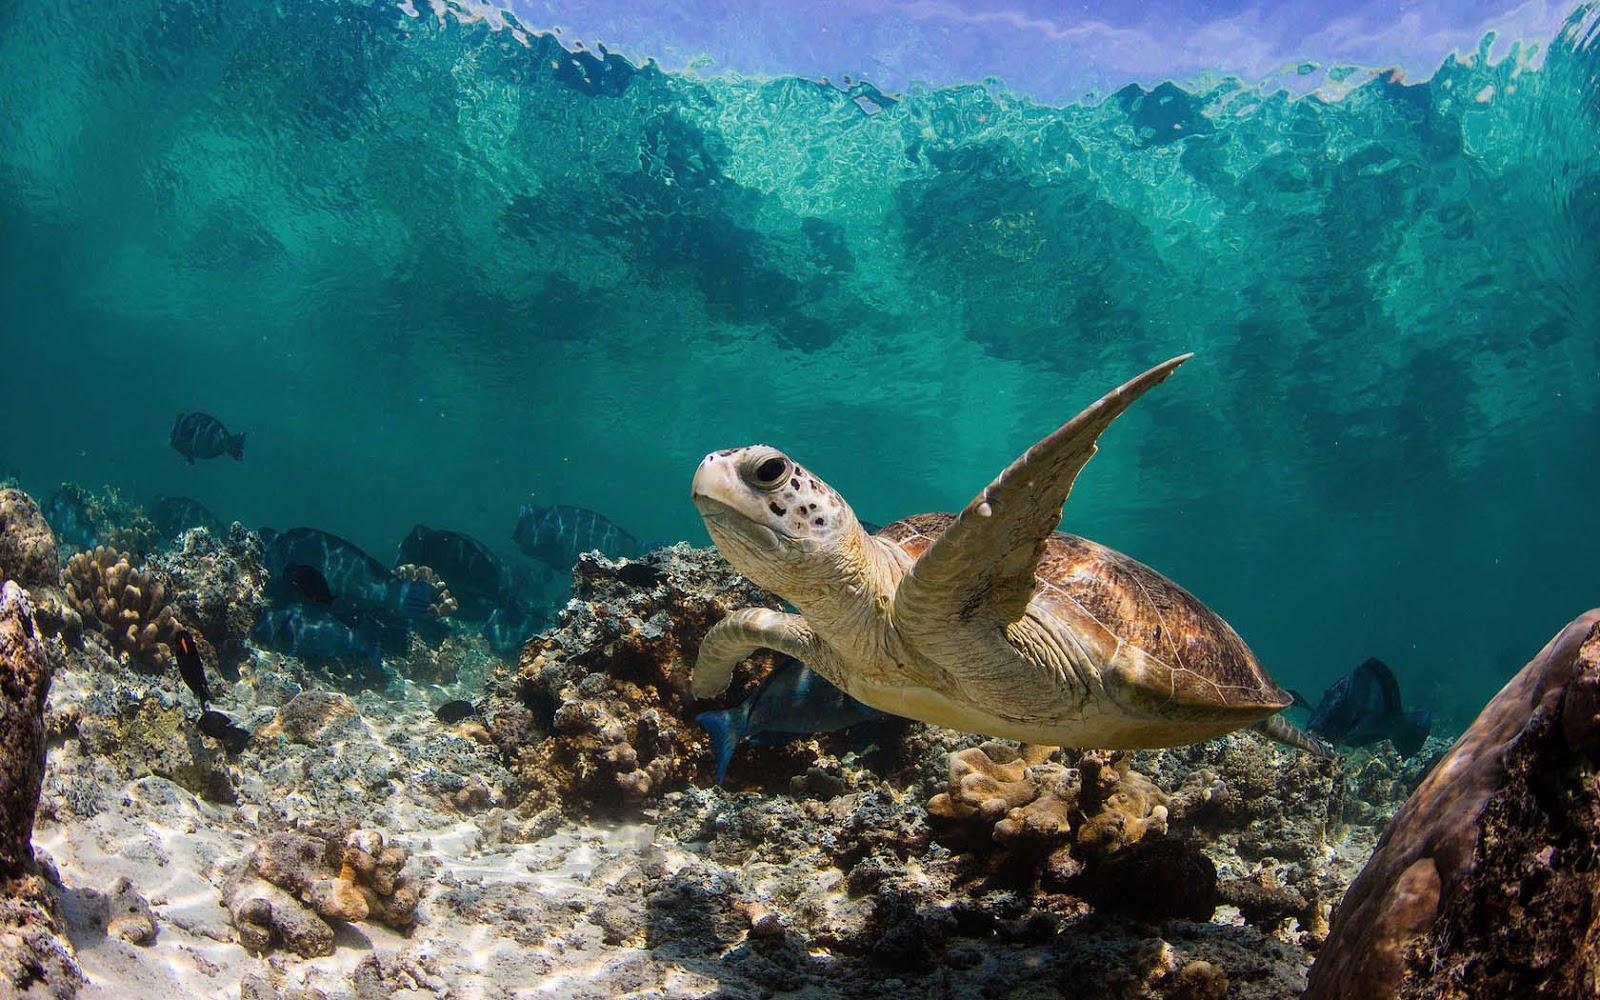 Turtle Underwater Wallpapers Wallpaper Cave